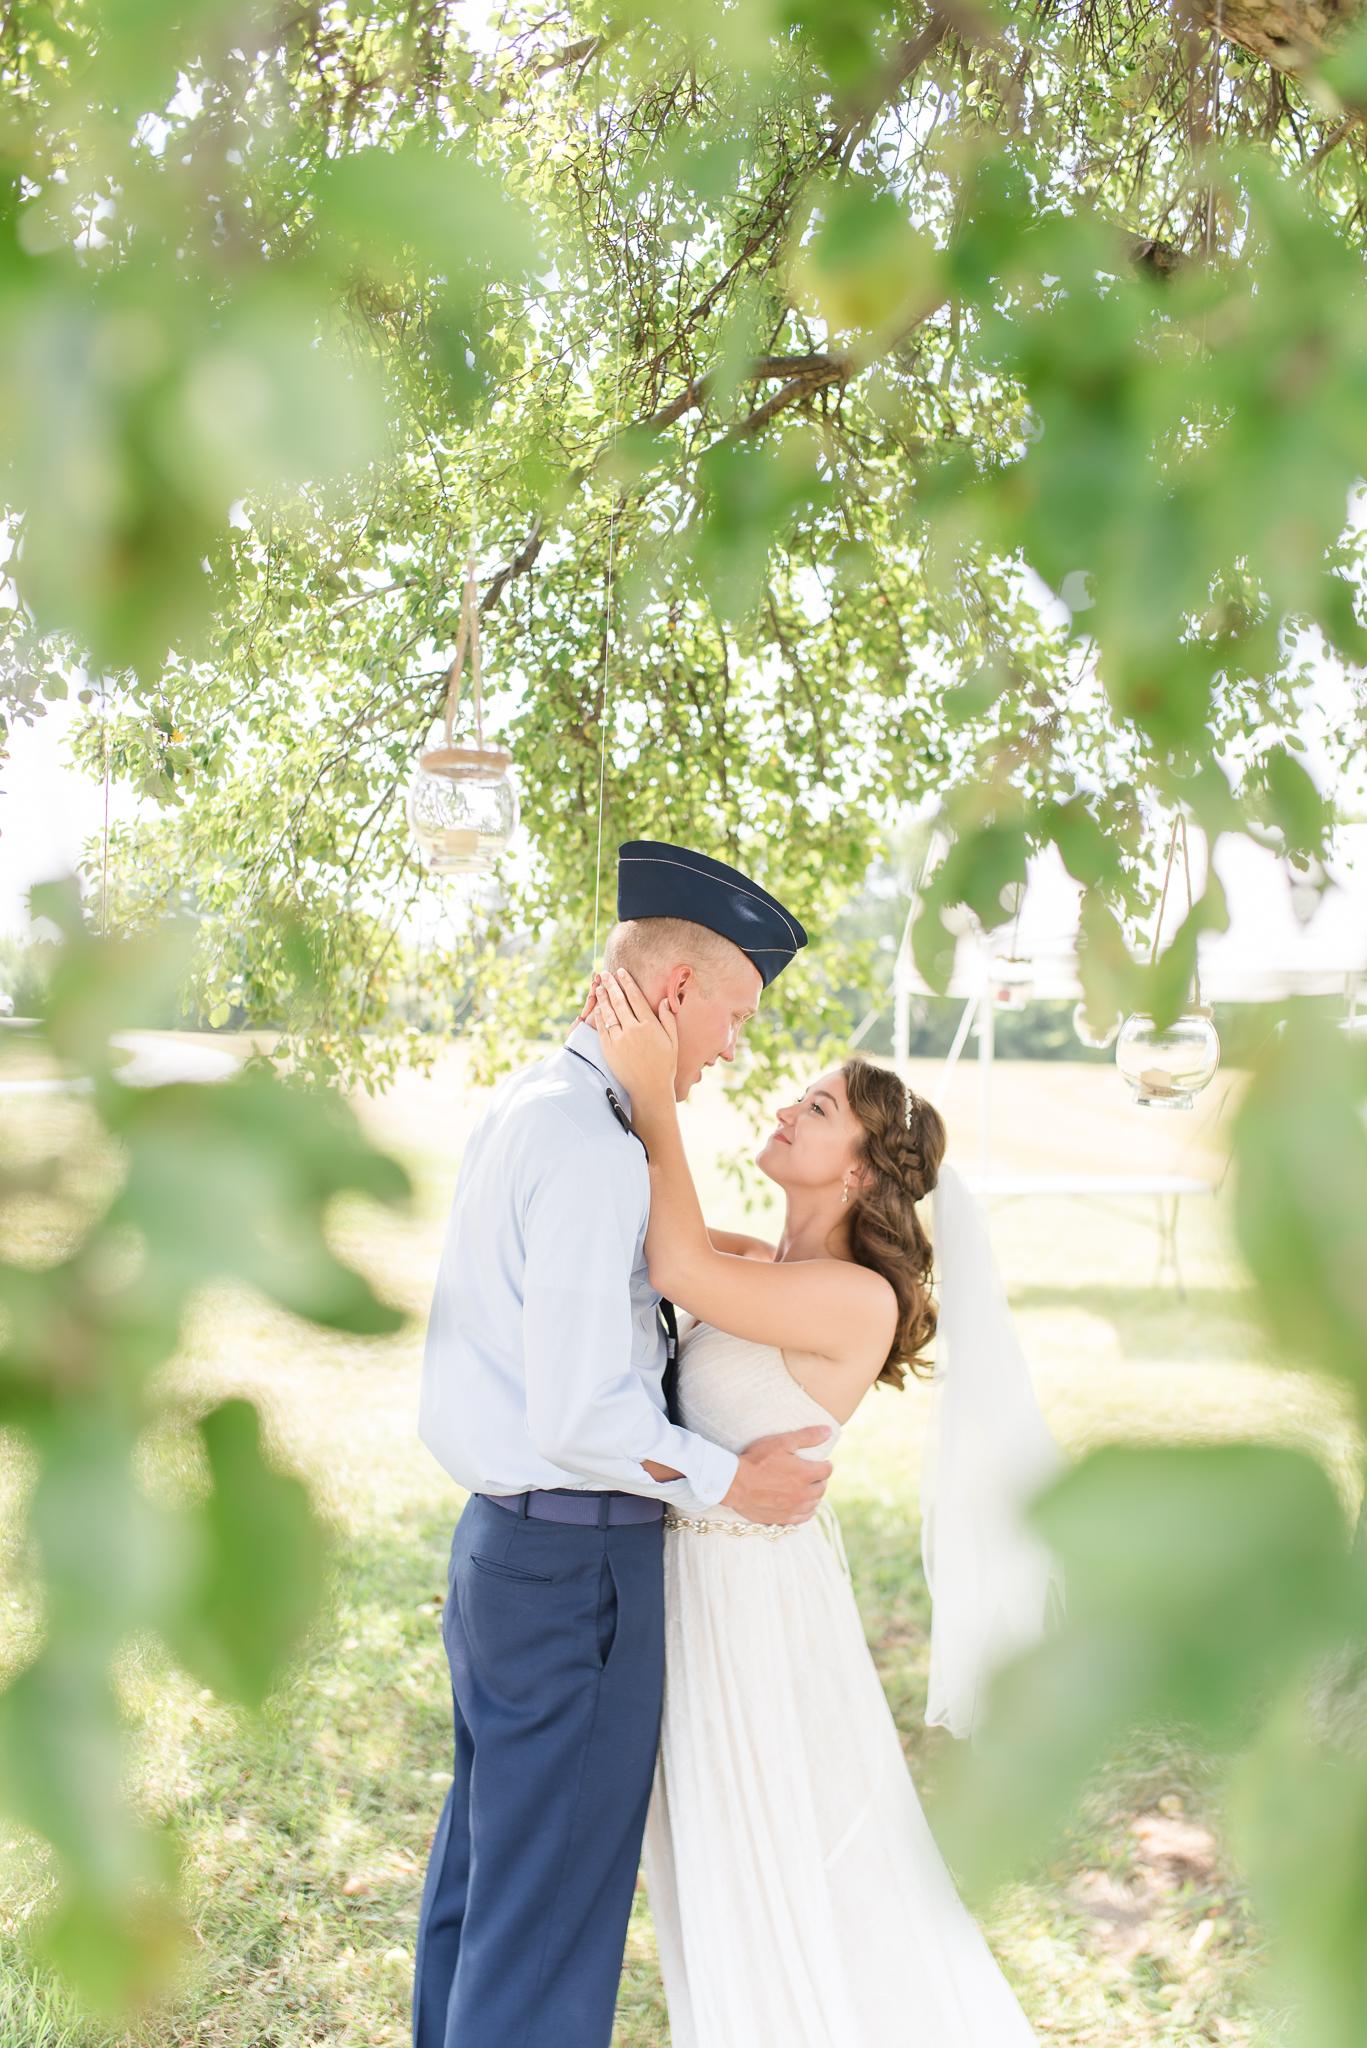 Anderson, Indiana Wedding Photographers4326.jpg